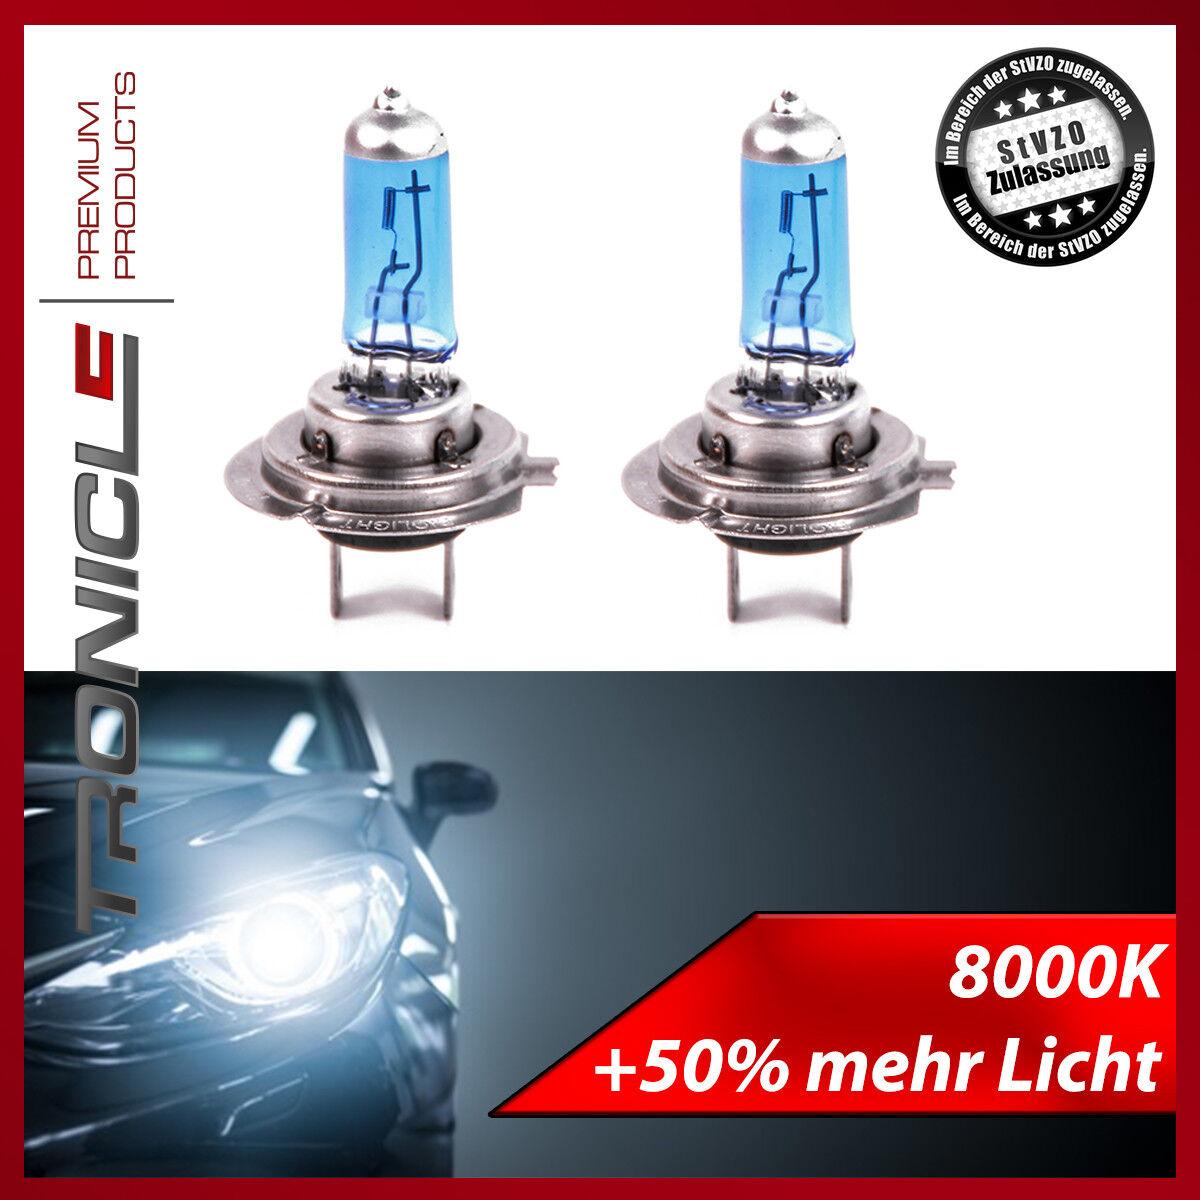 Halogen Sockel Leuchtmittel 8000K Xenon Gas Ultra White E-Prüfzeichen Tronicle